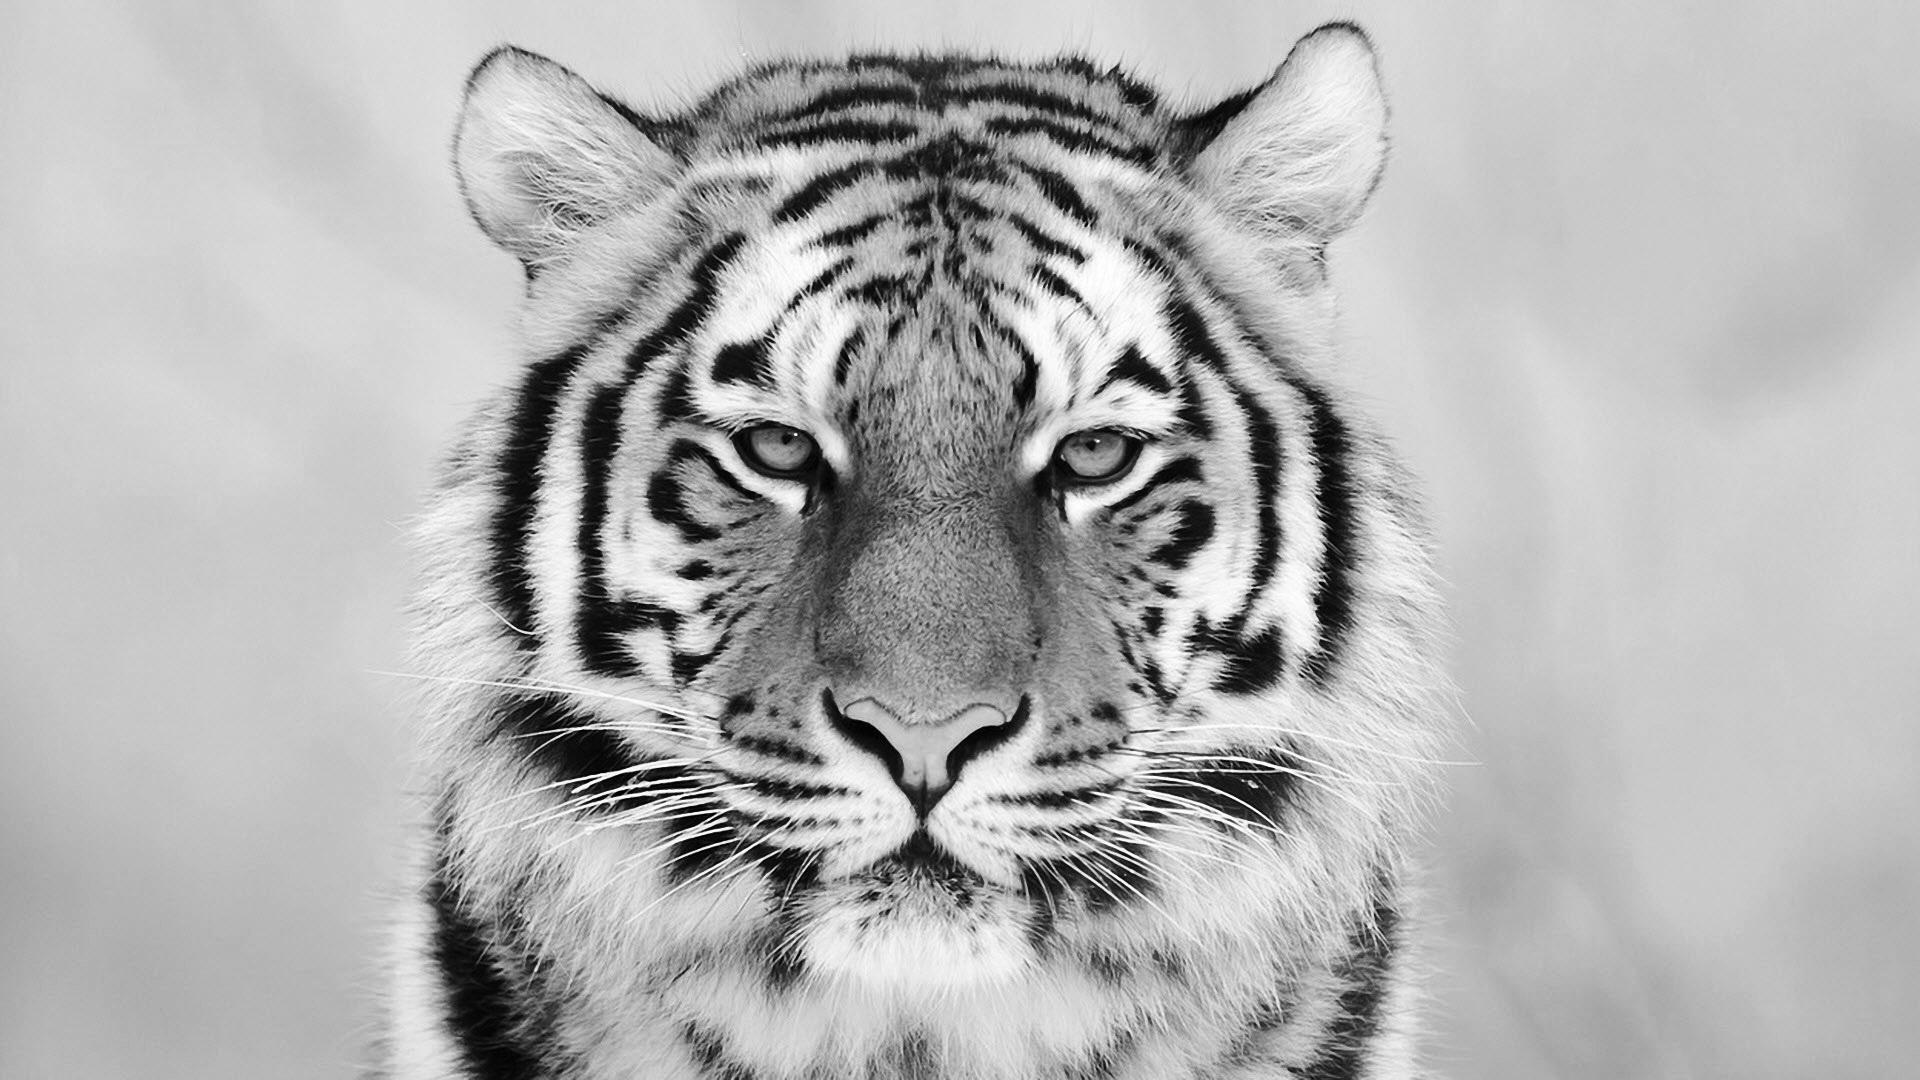 White Tiger Wallpaper Free